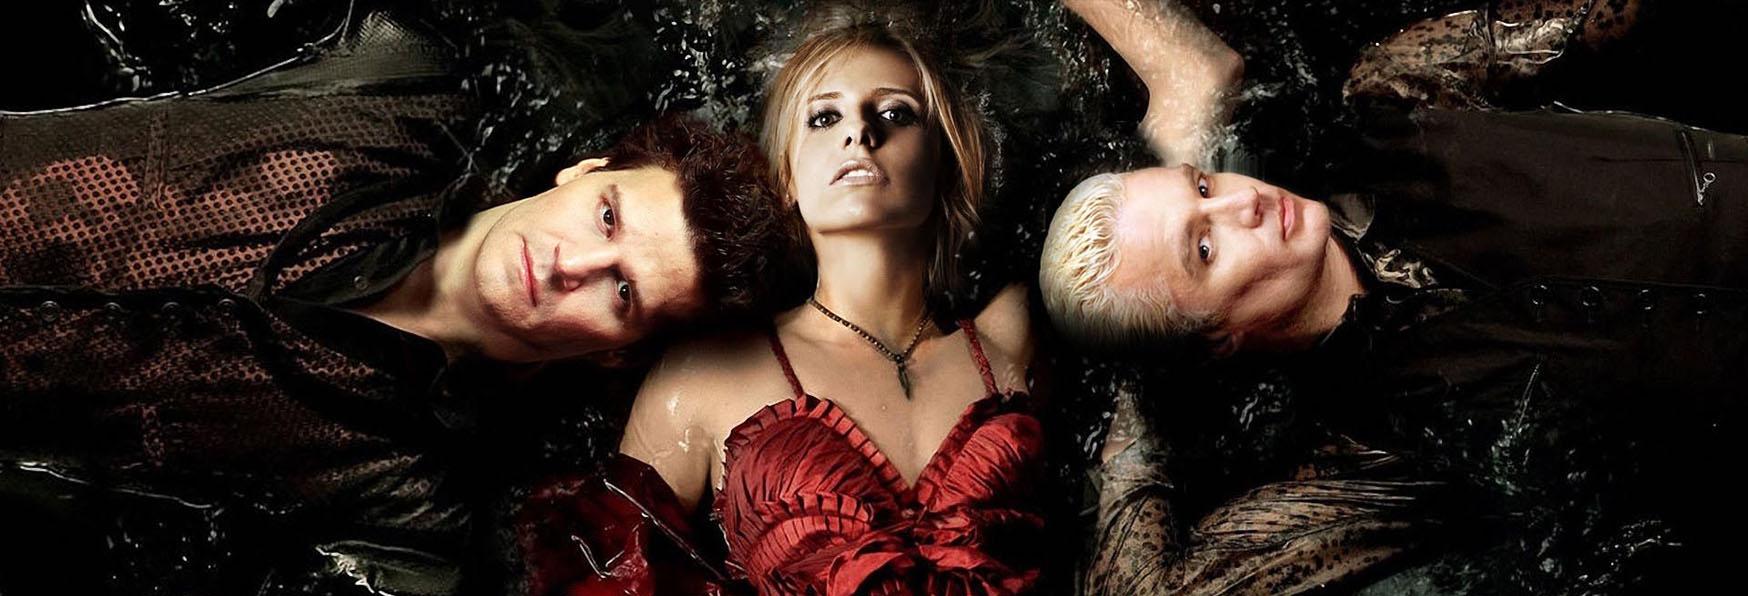 È ufficiale, ci sarà un remake di Buffy